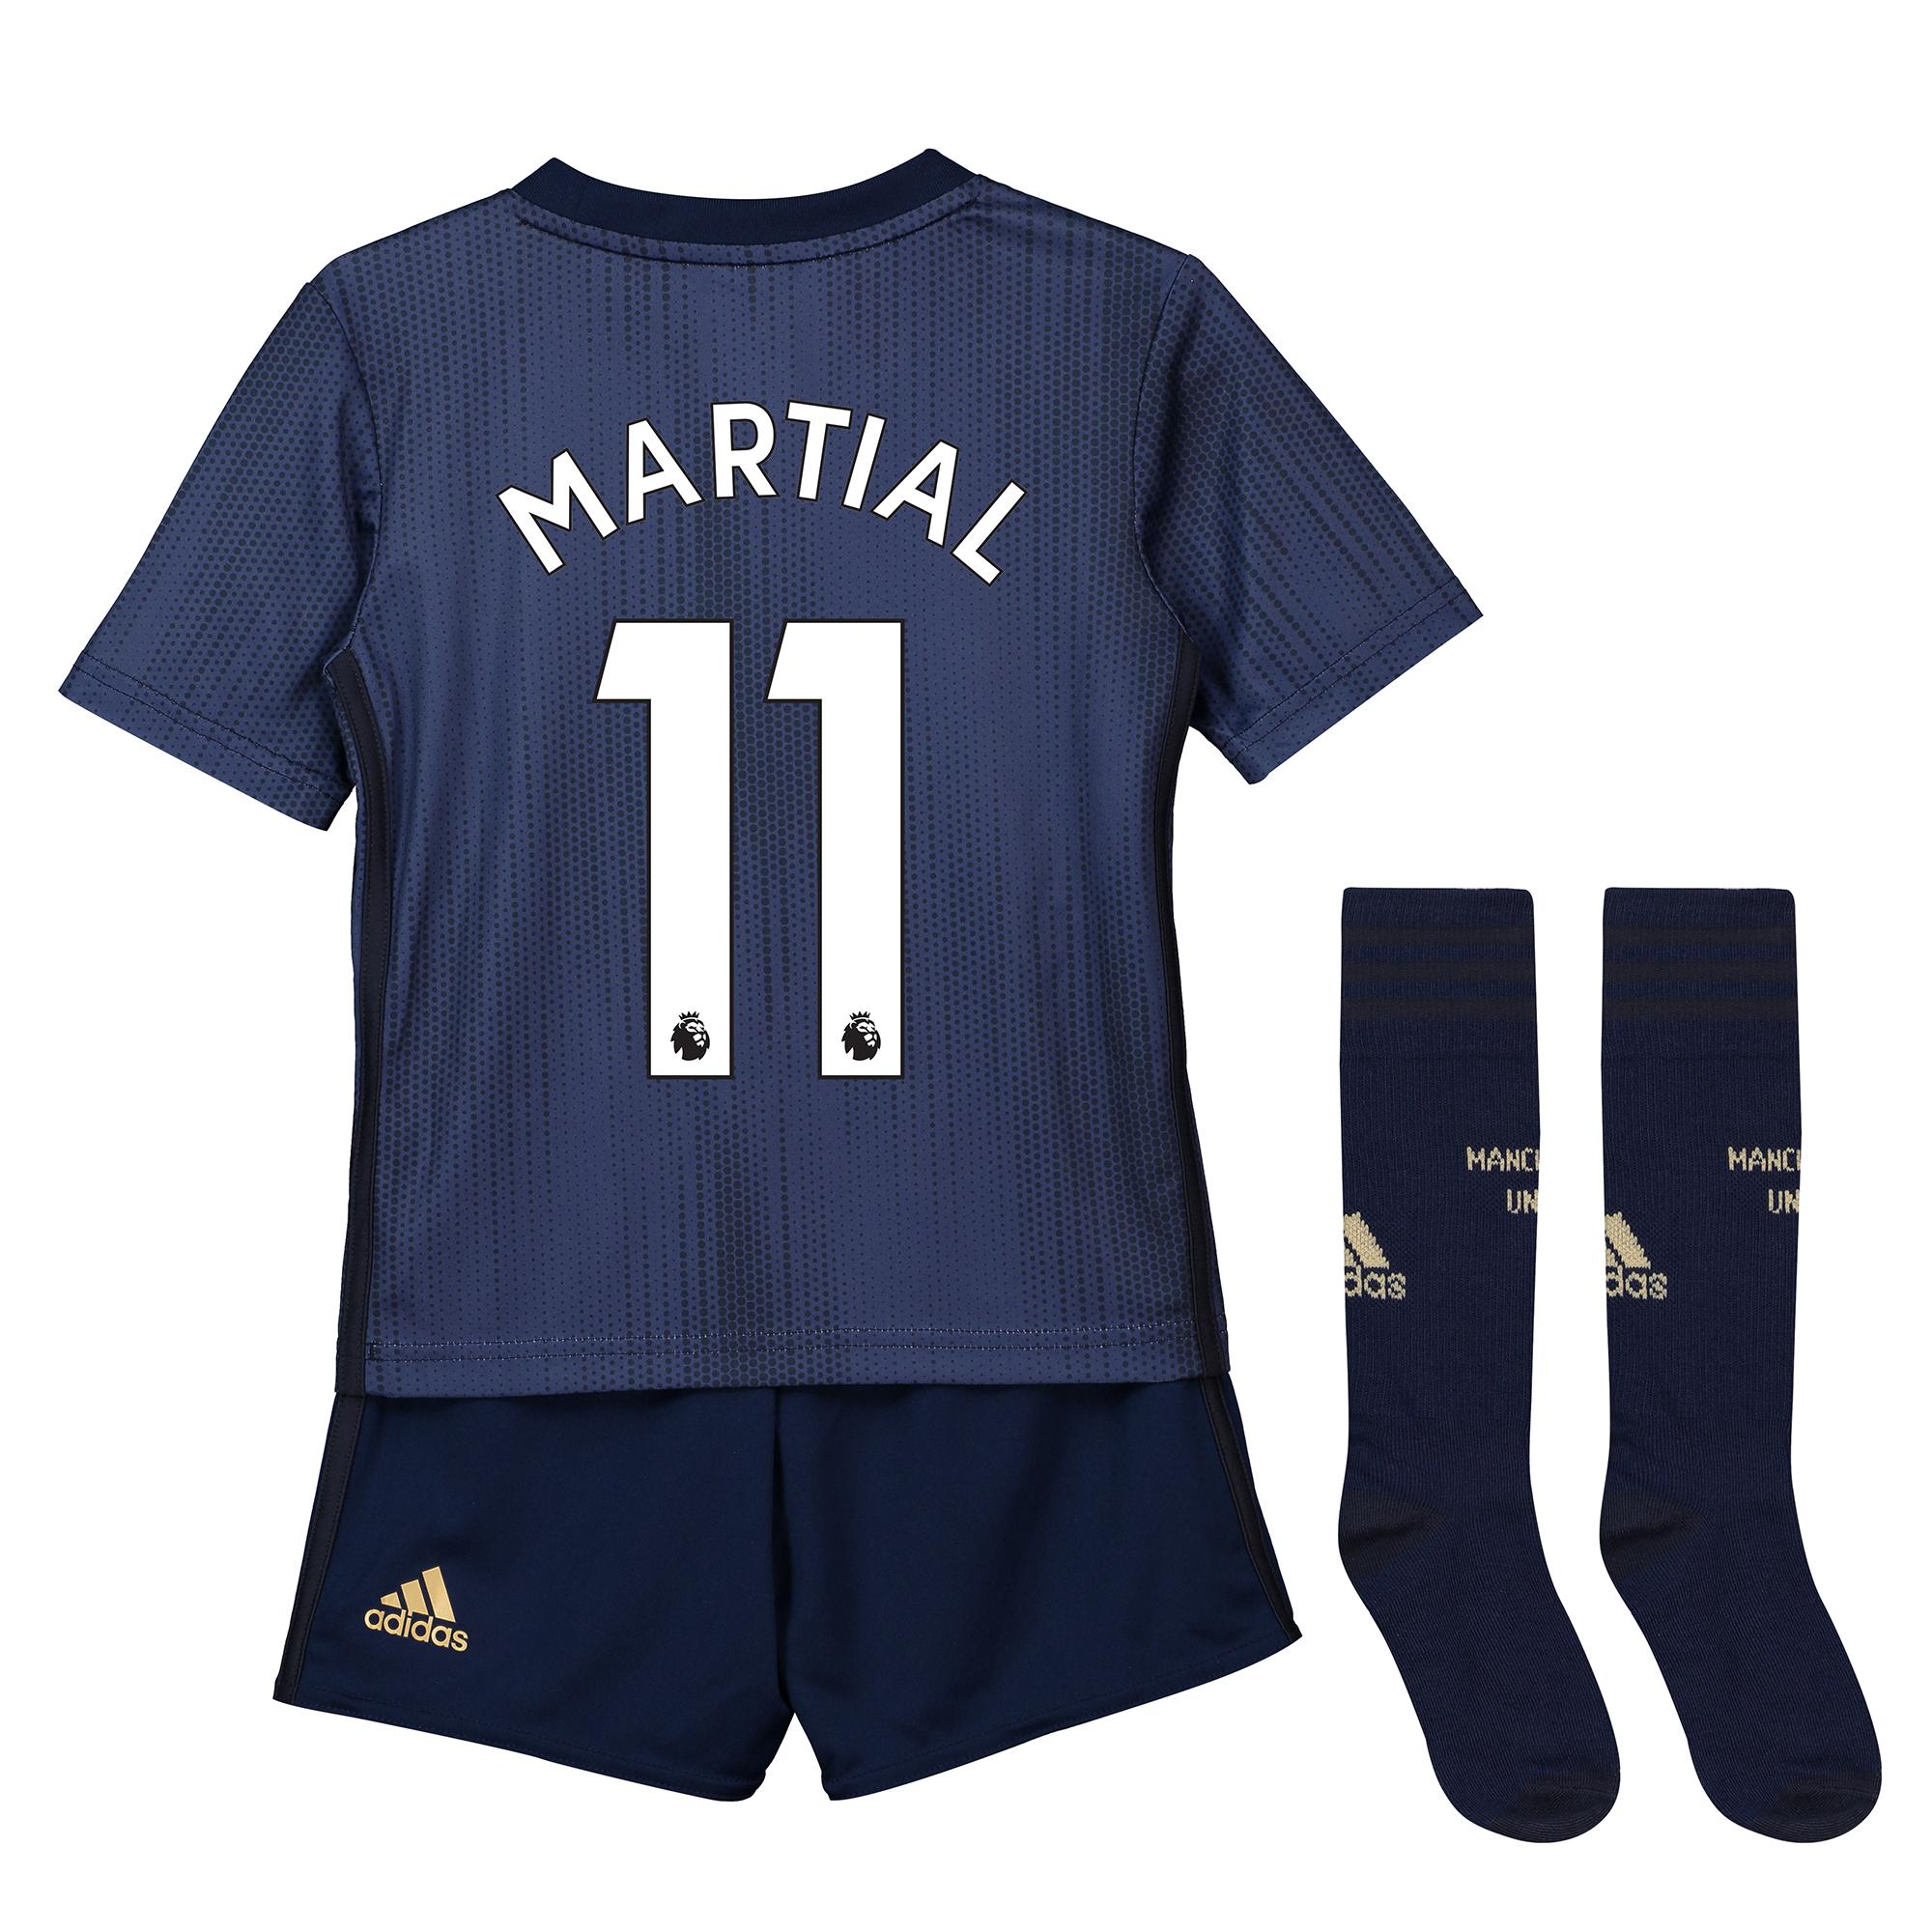 Tercera equipación en tamaño mini del Manchester United 2018-19 dorsal Martial 11